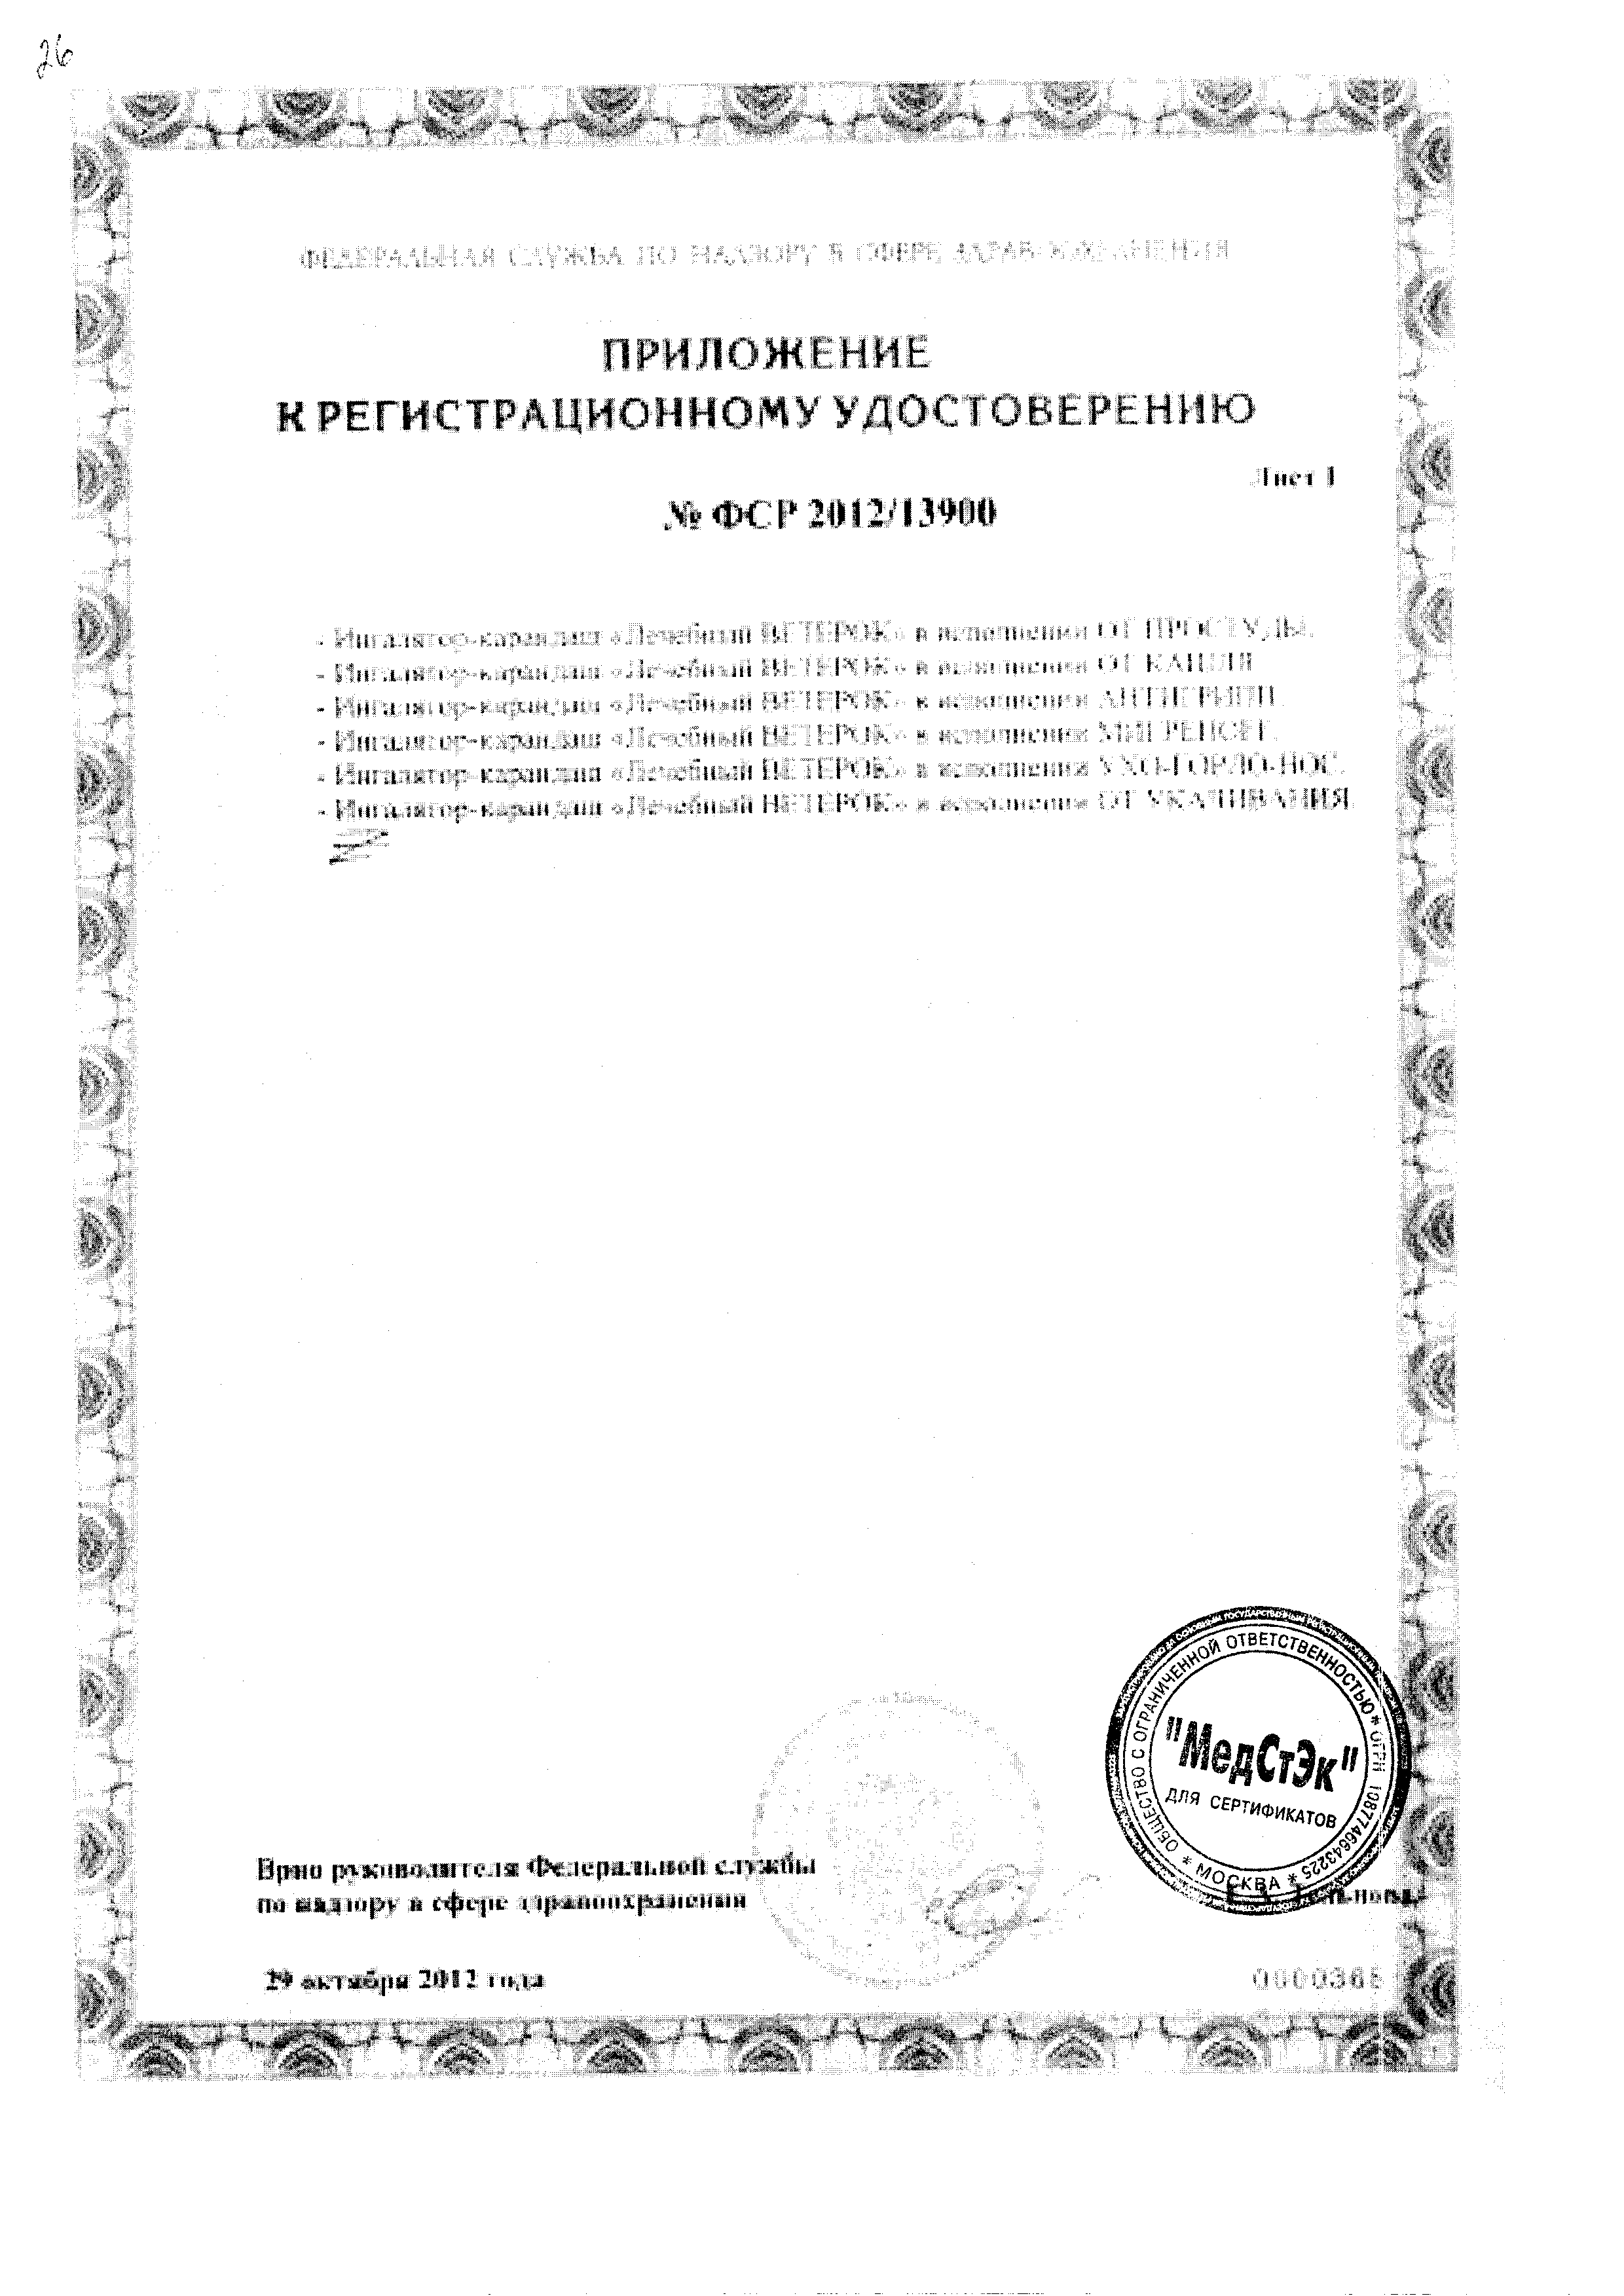 Ингалятор-карандаш Лечебный ветерок От укачивания сертификат